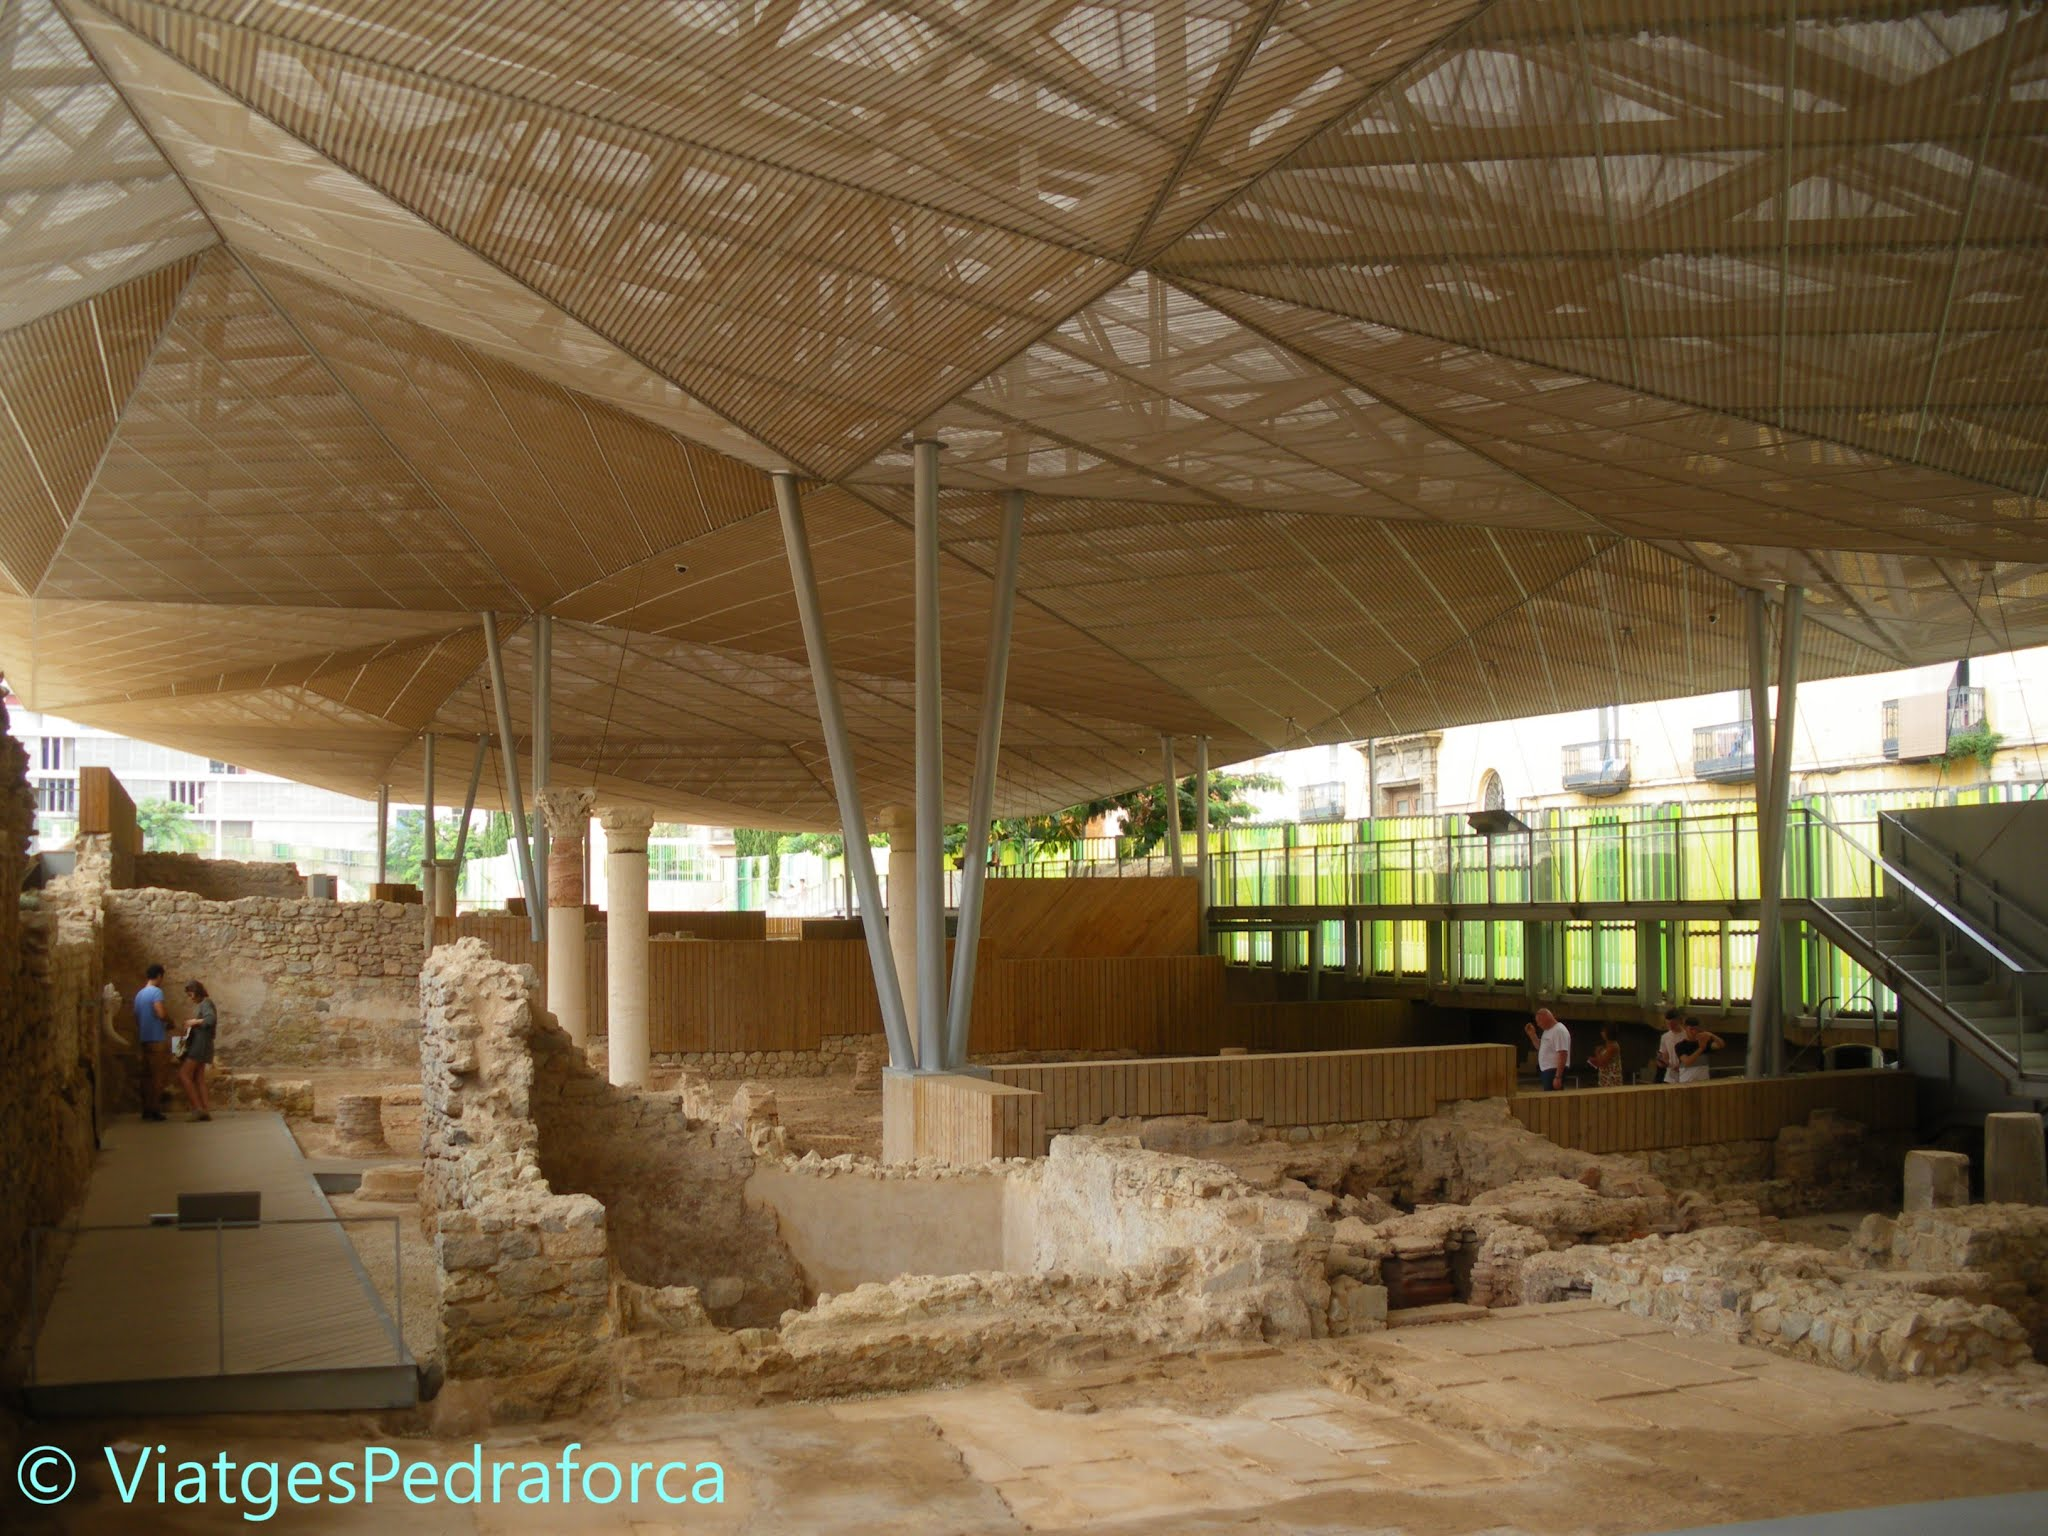 Parc arqueològic del Cerro del Molinete